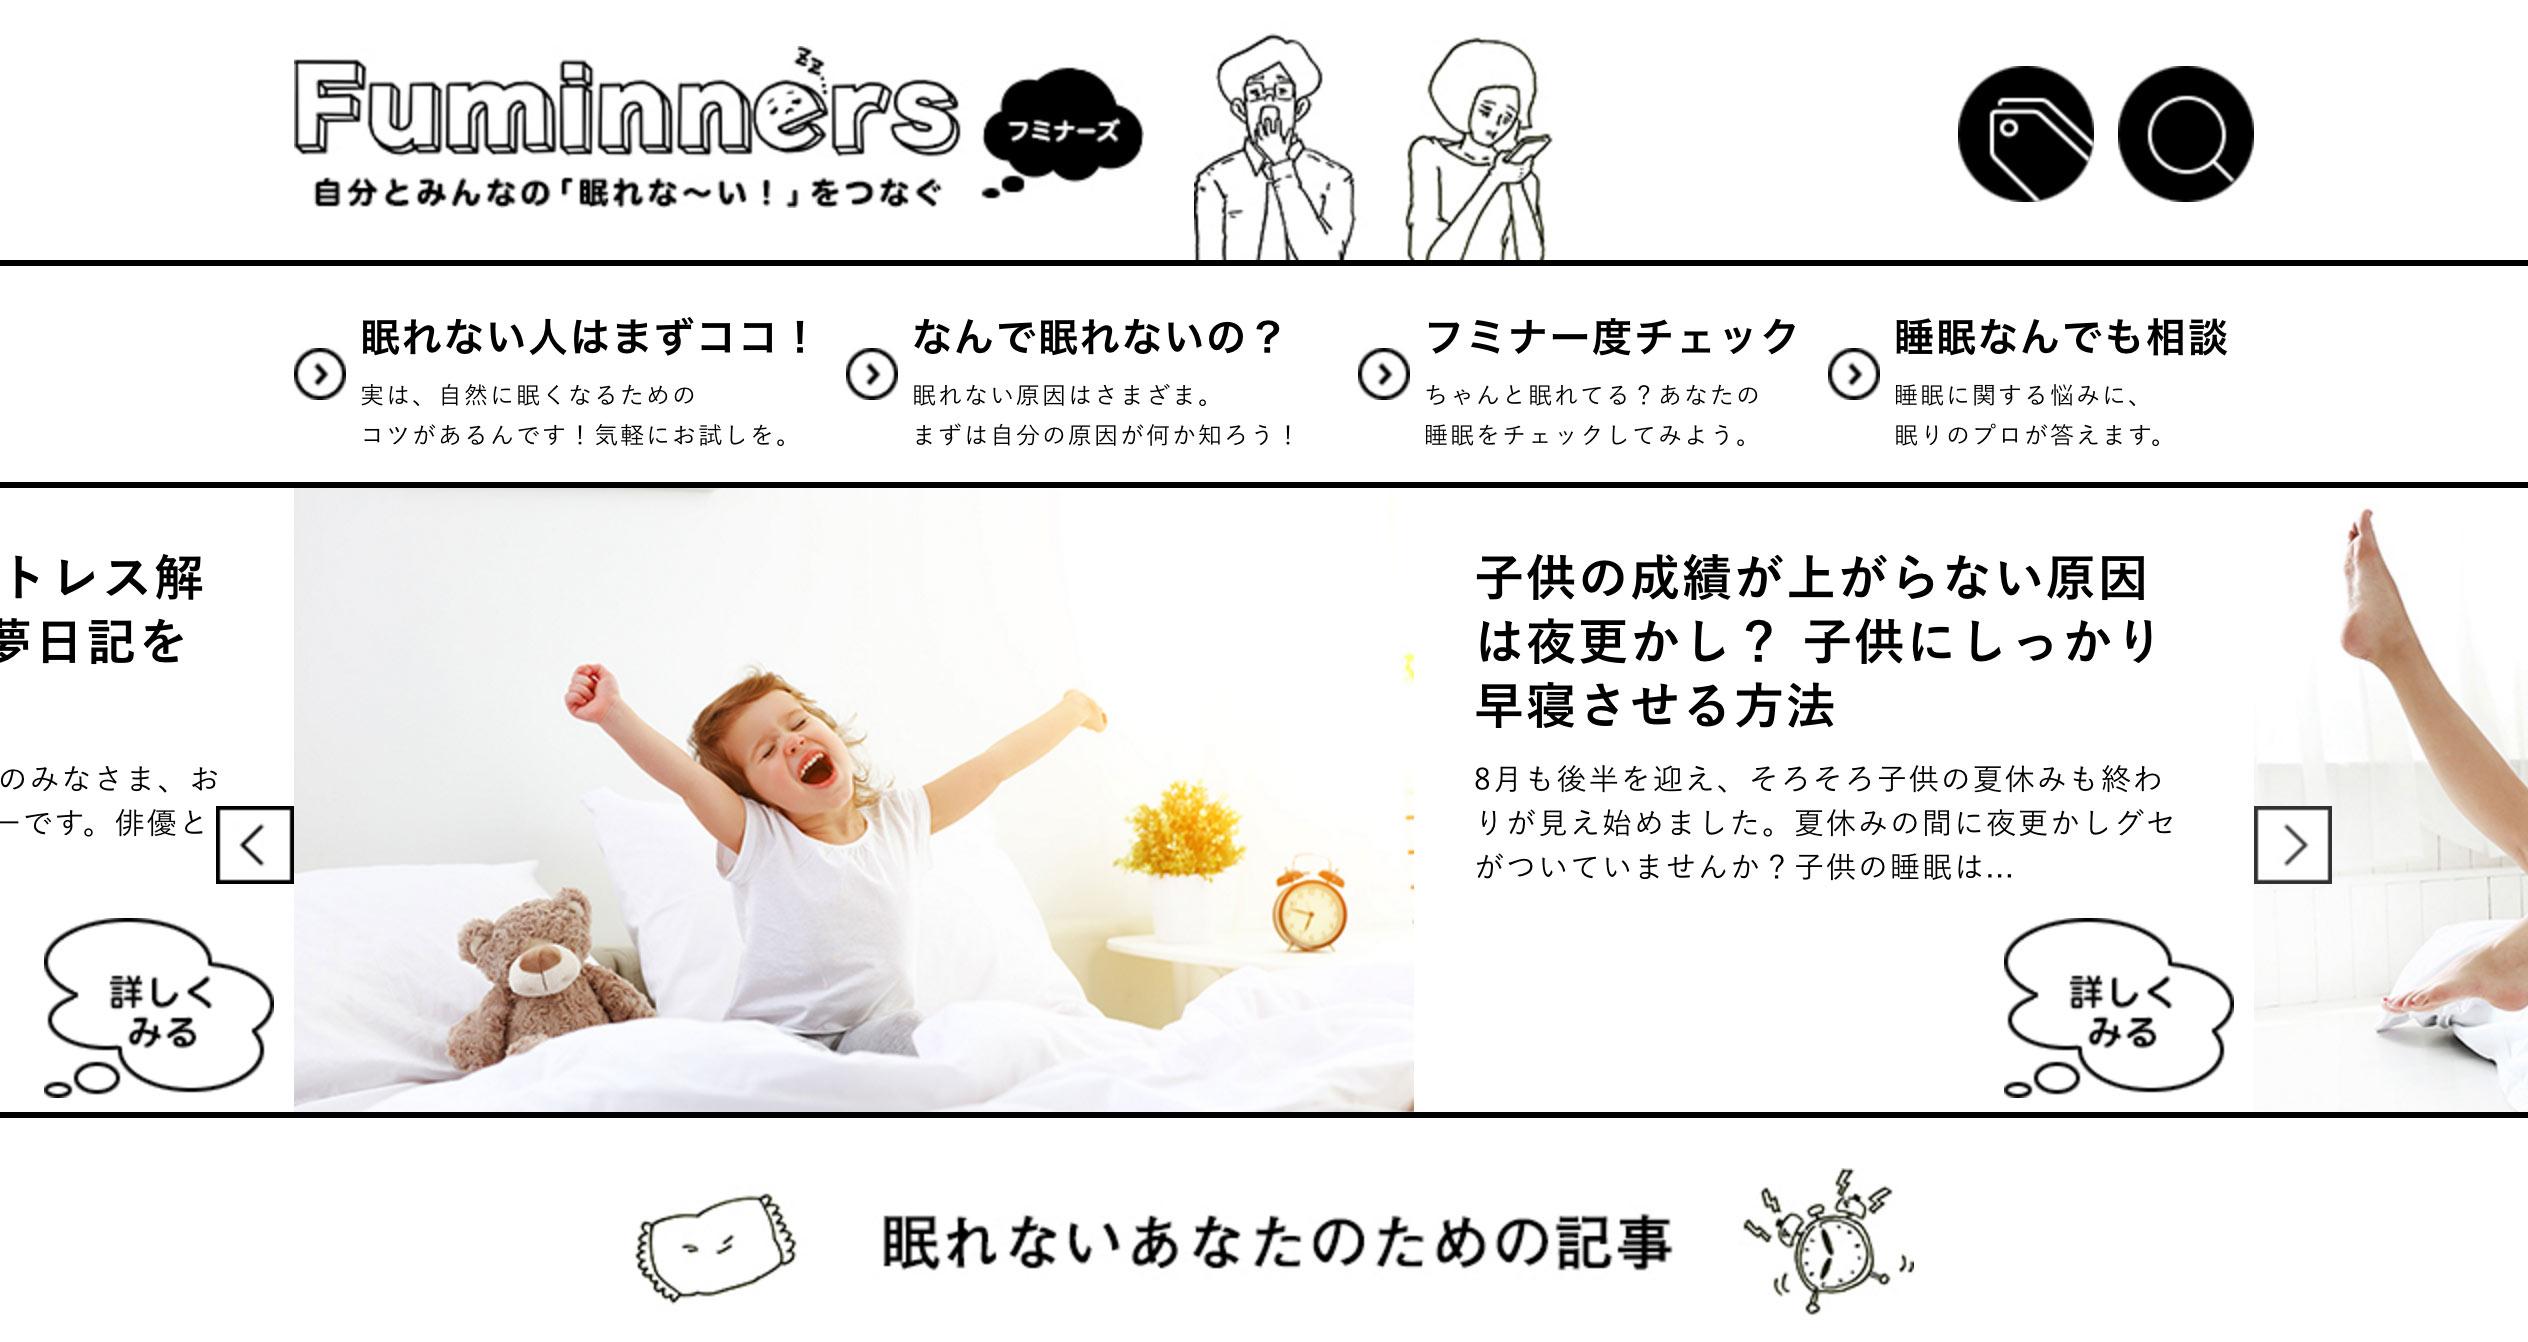 Fuminners